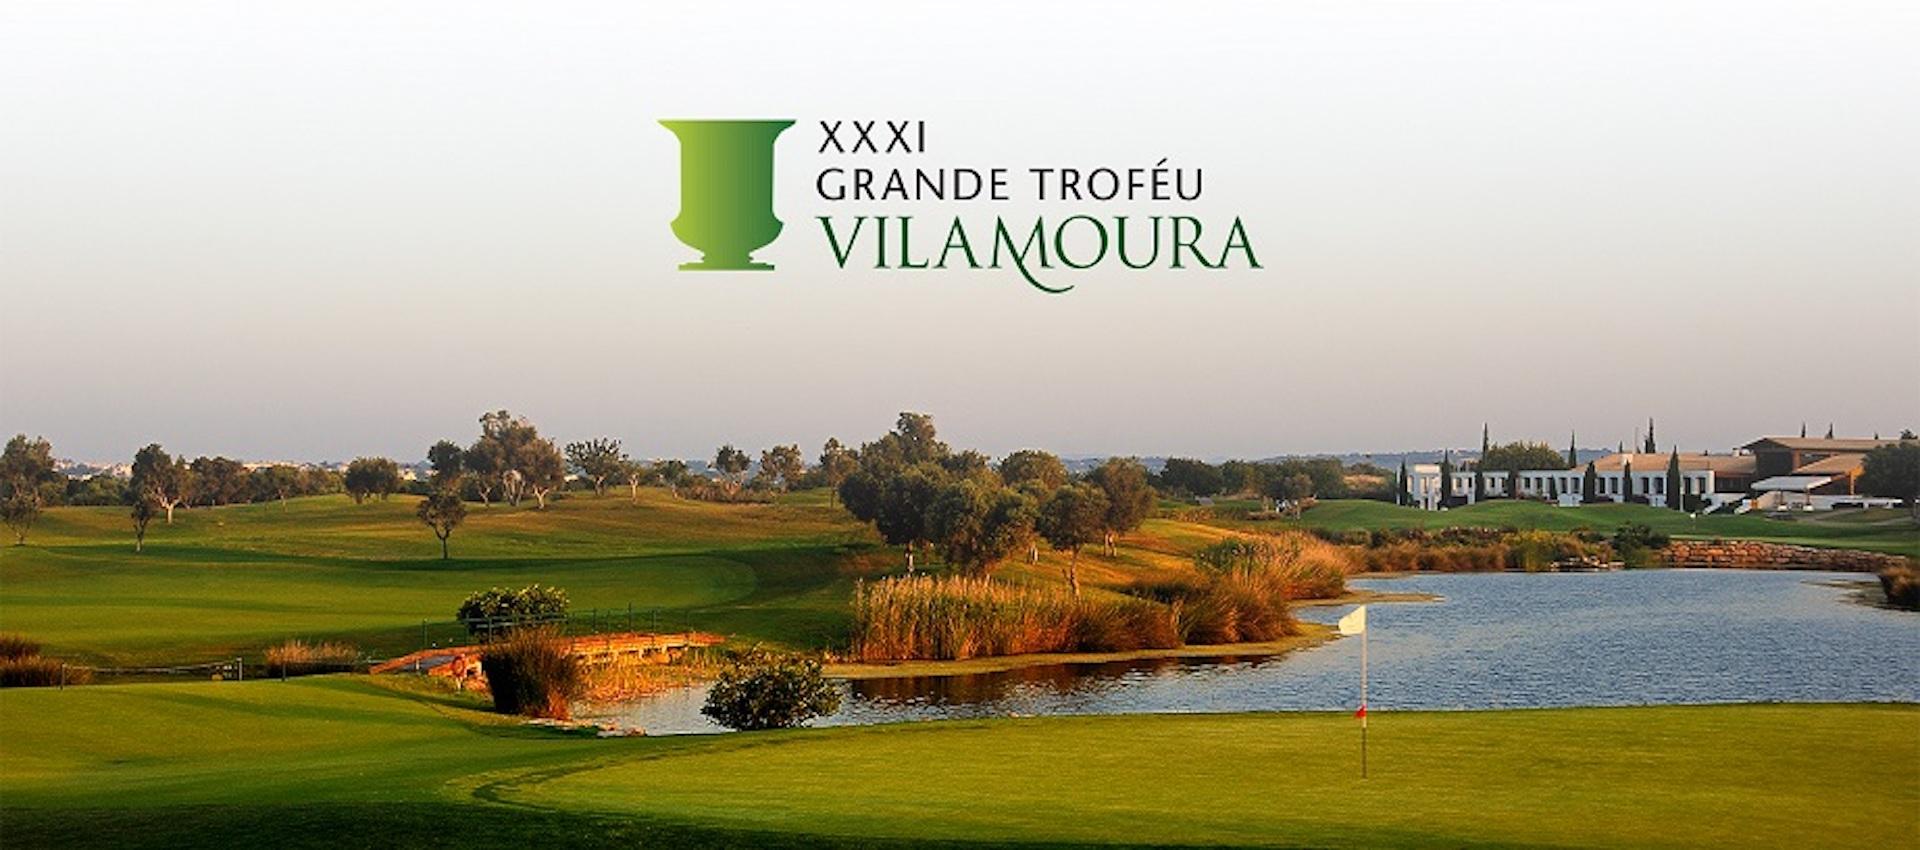 Dom Pedro Hotel & Golf Collection Celebrates